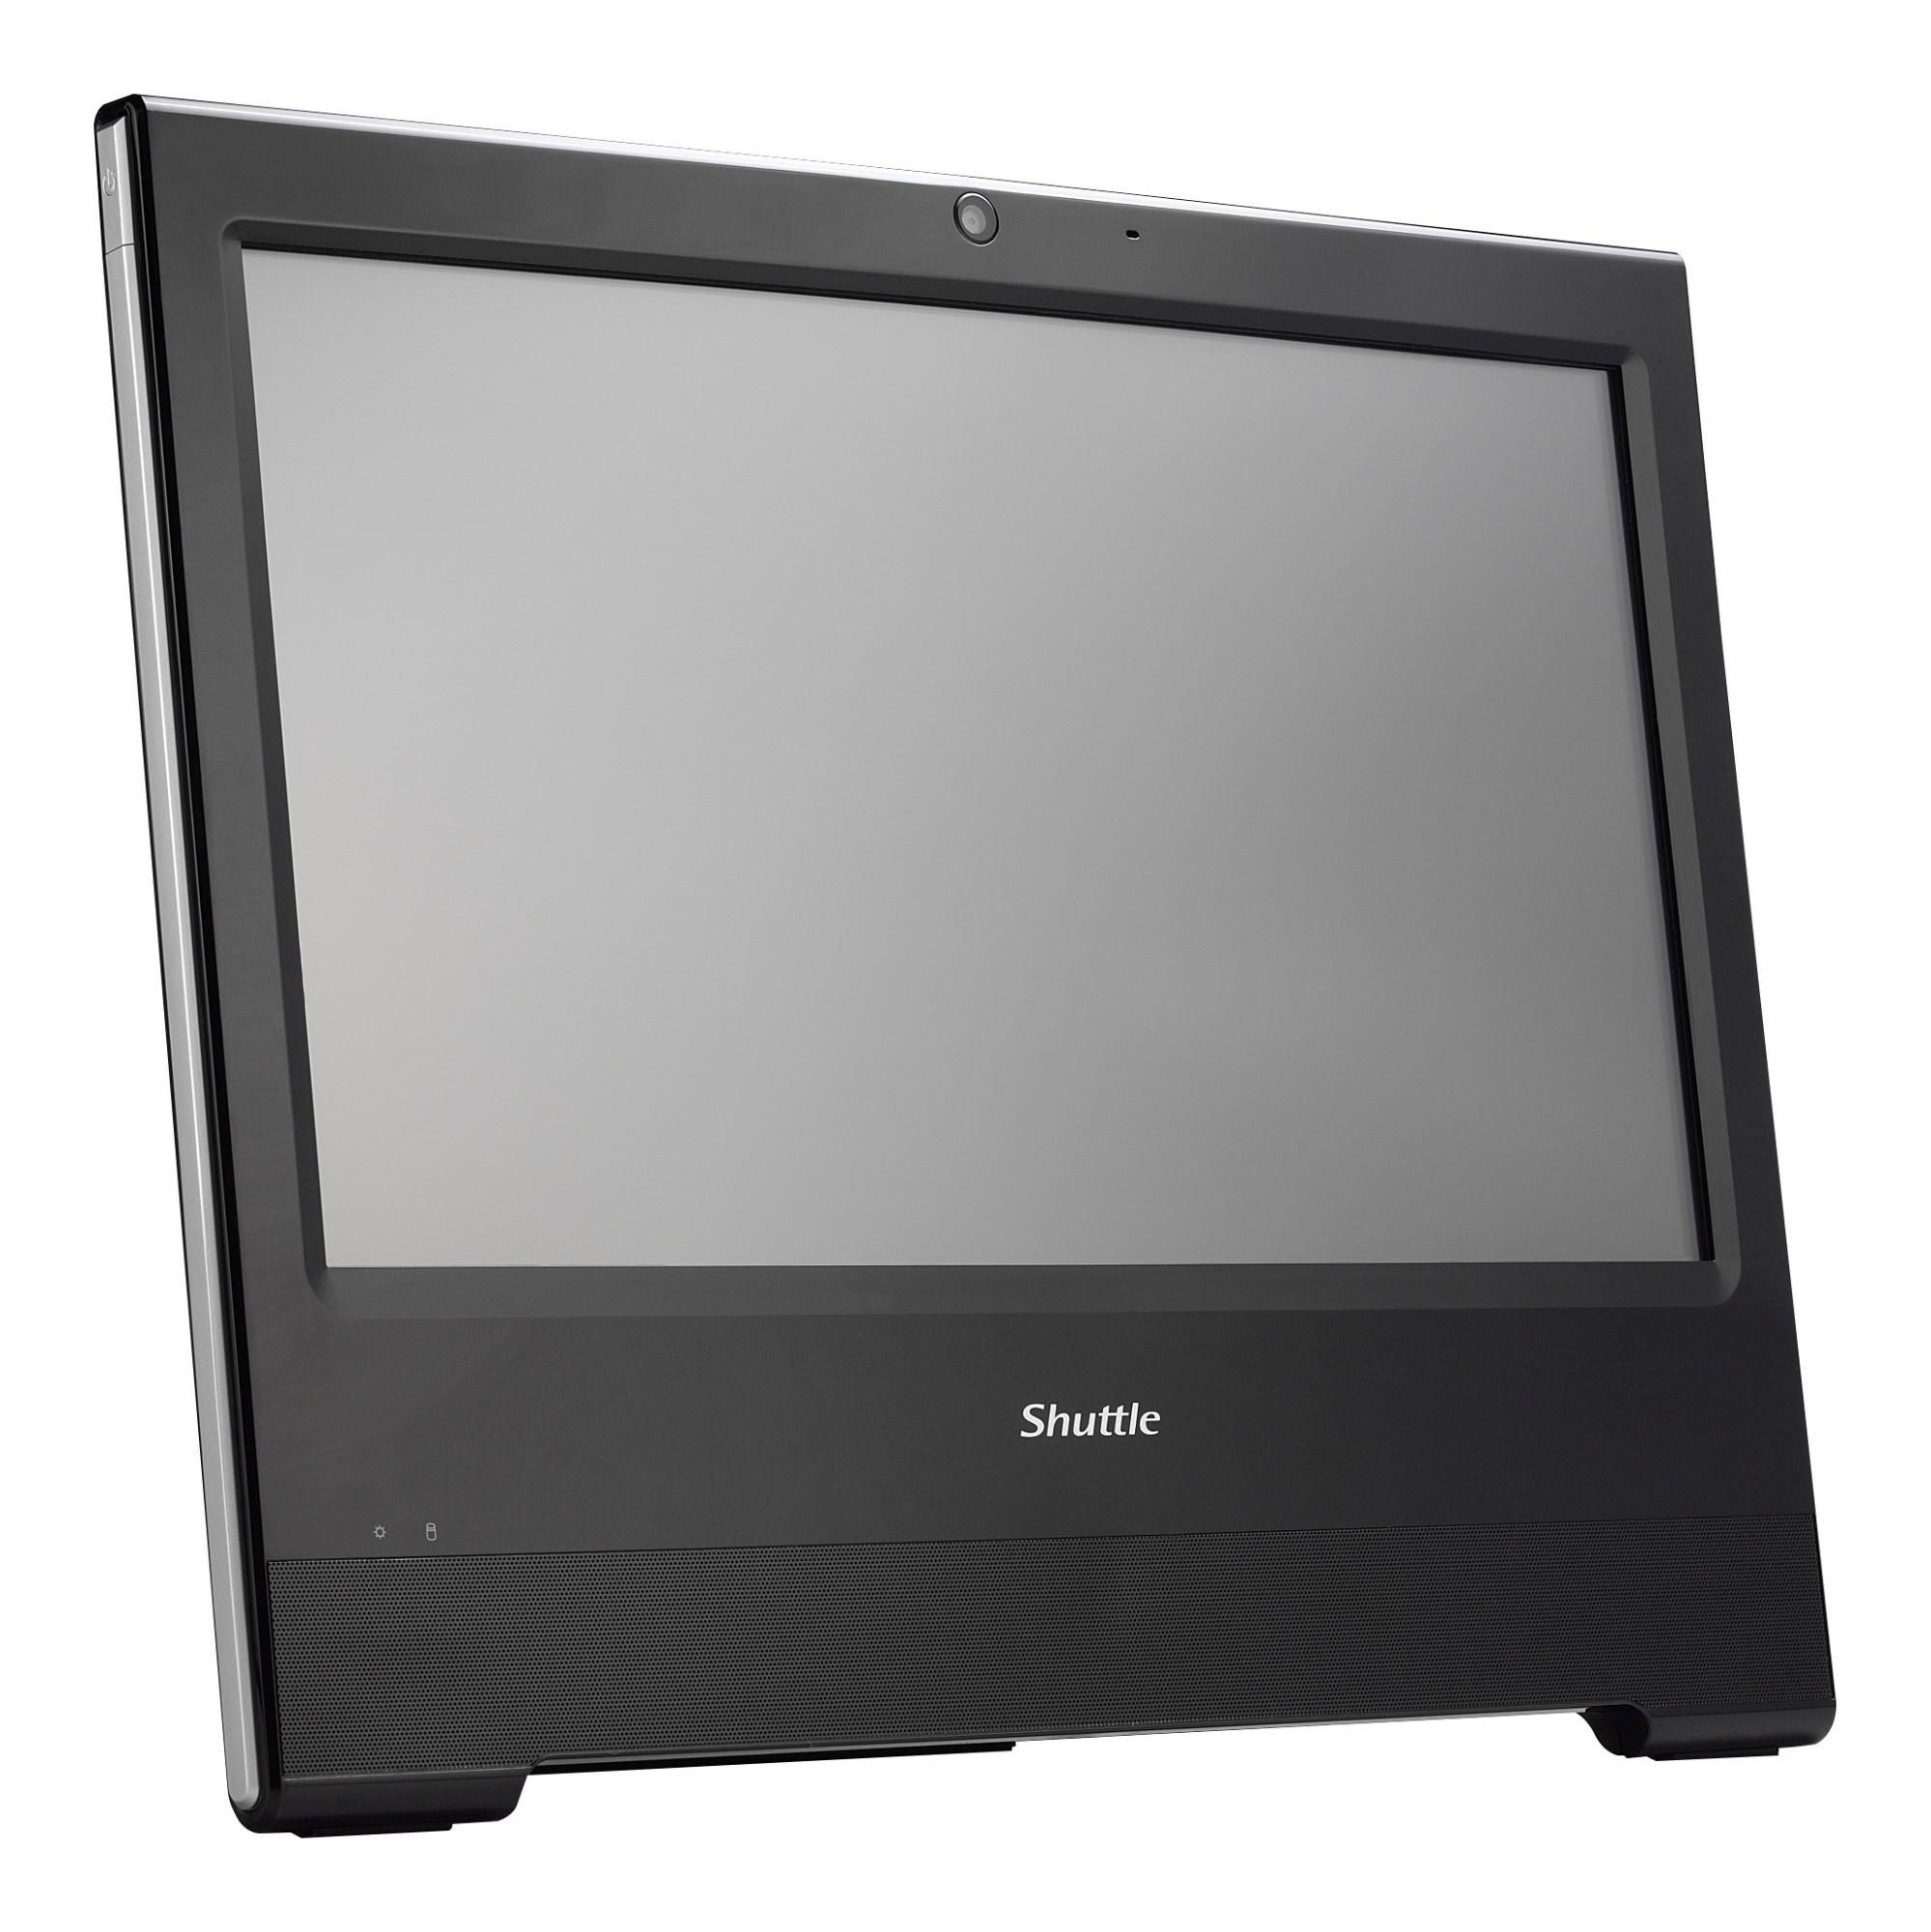 Shuttle X50V5U3 All-in-One PC (i3-7100U)